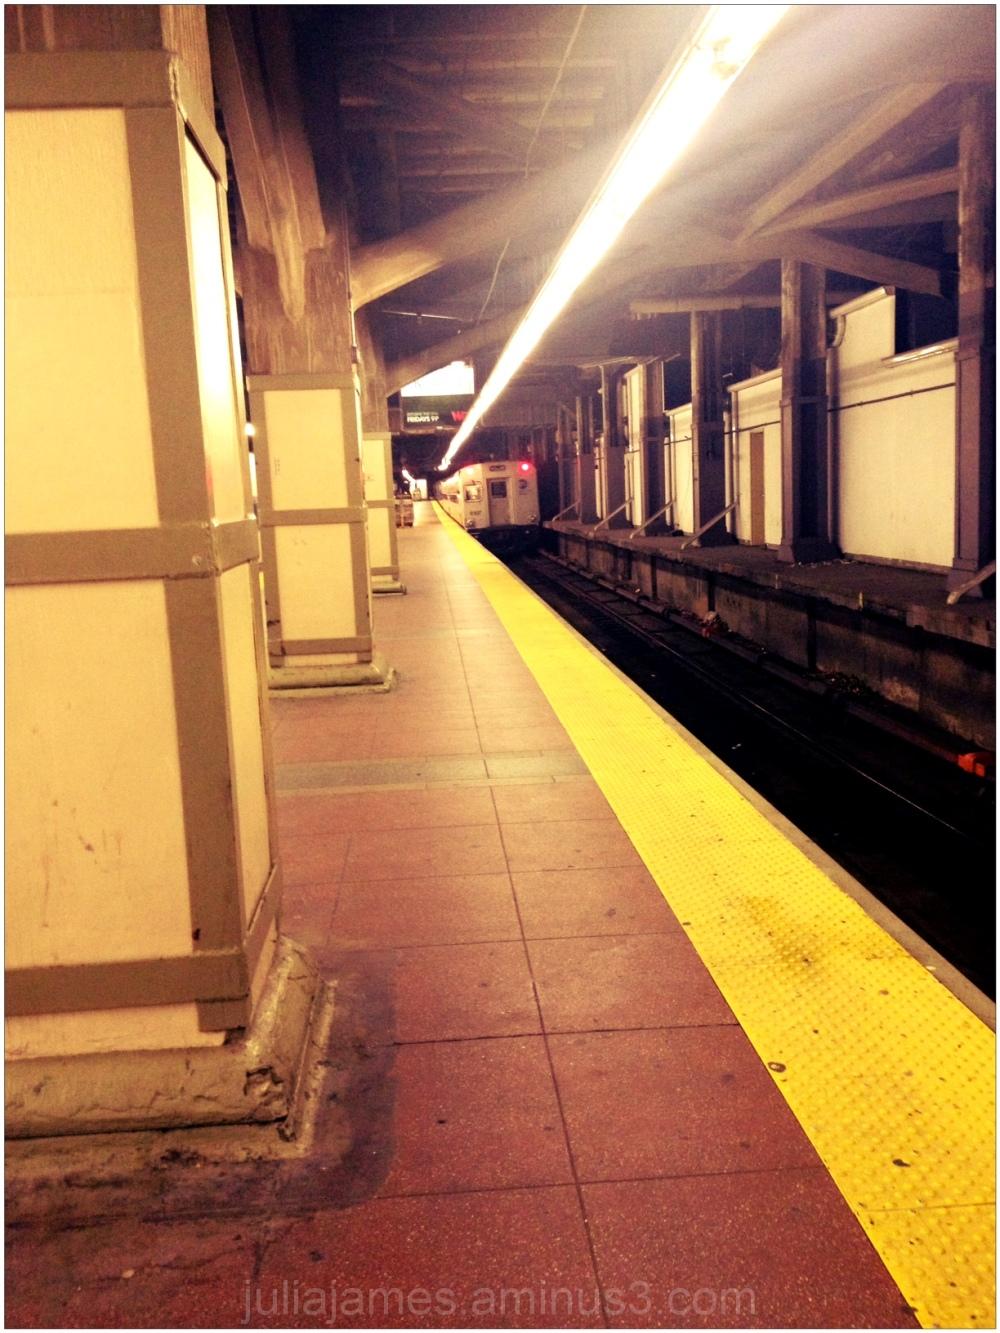 Hudson Line, 1 April 2013, New York City